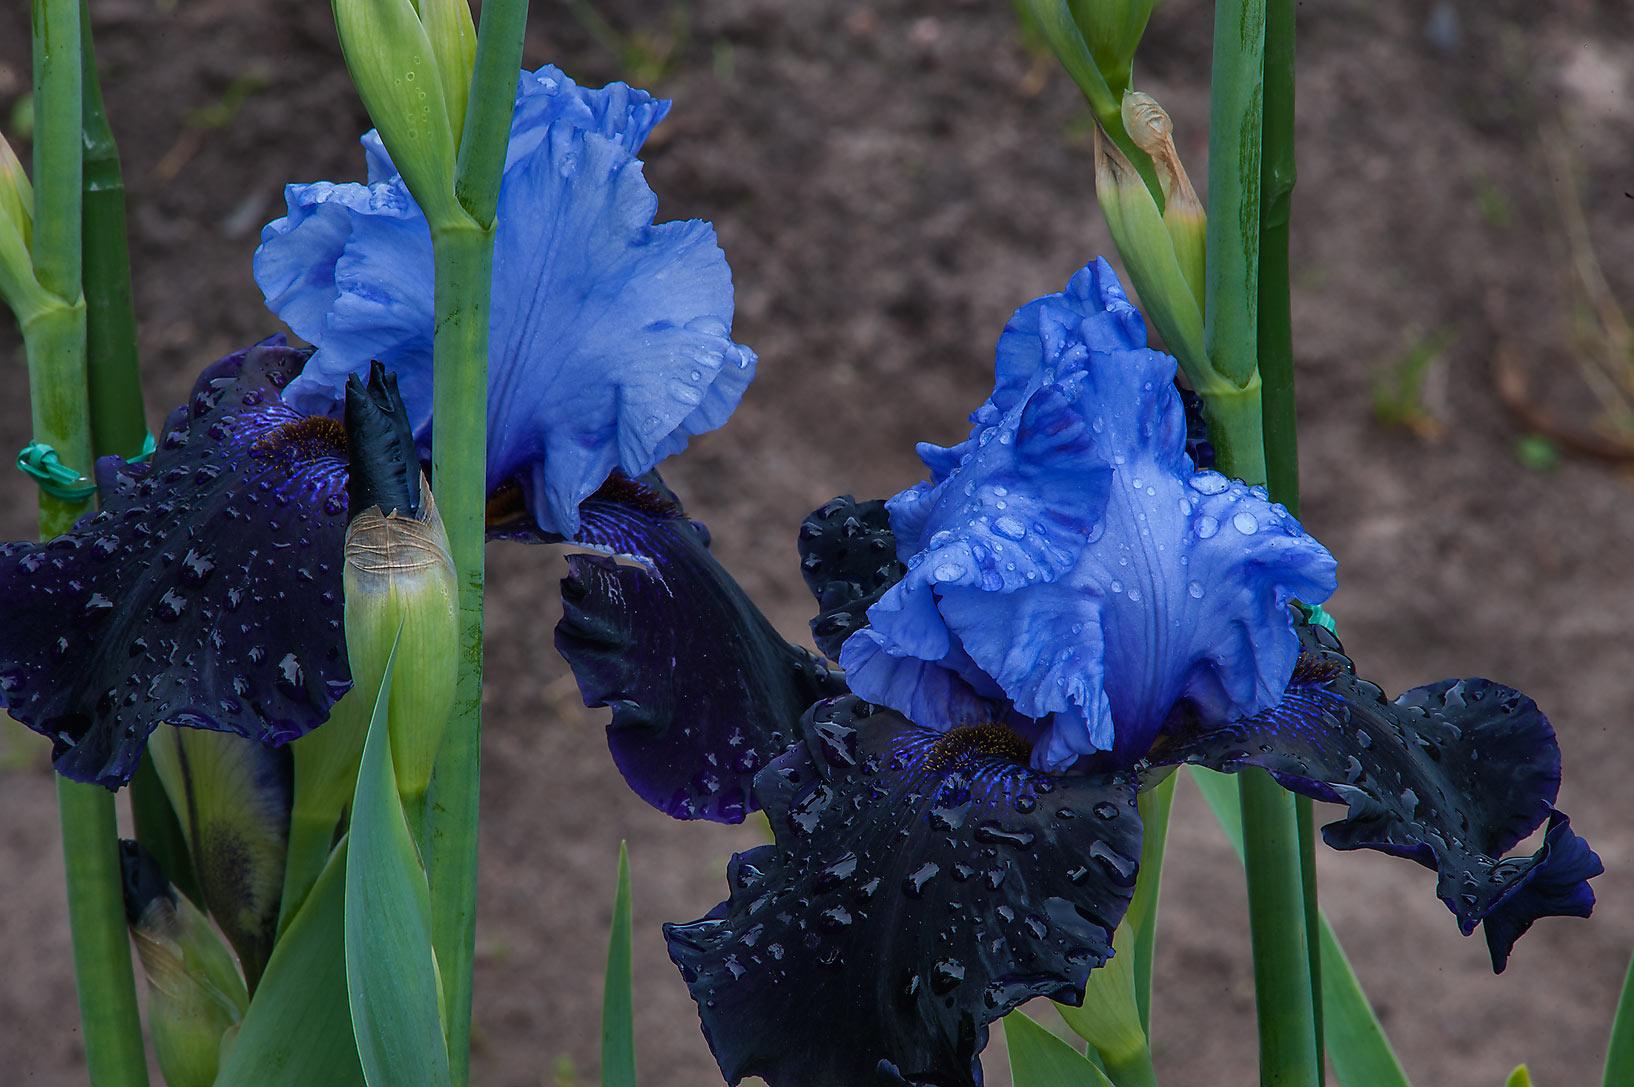 Photo 1434 10 Blue Iris Flowers In Botanic Gardens Of Komarov